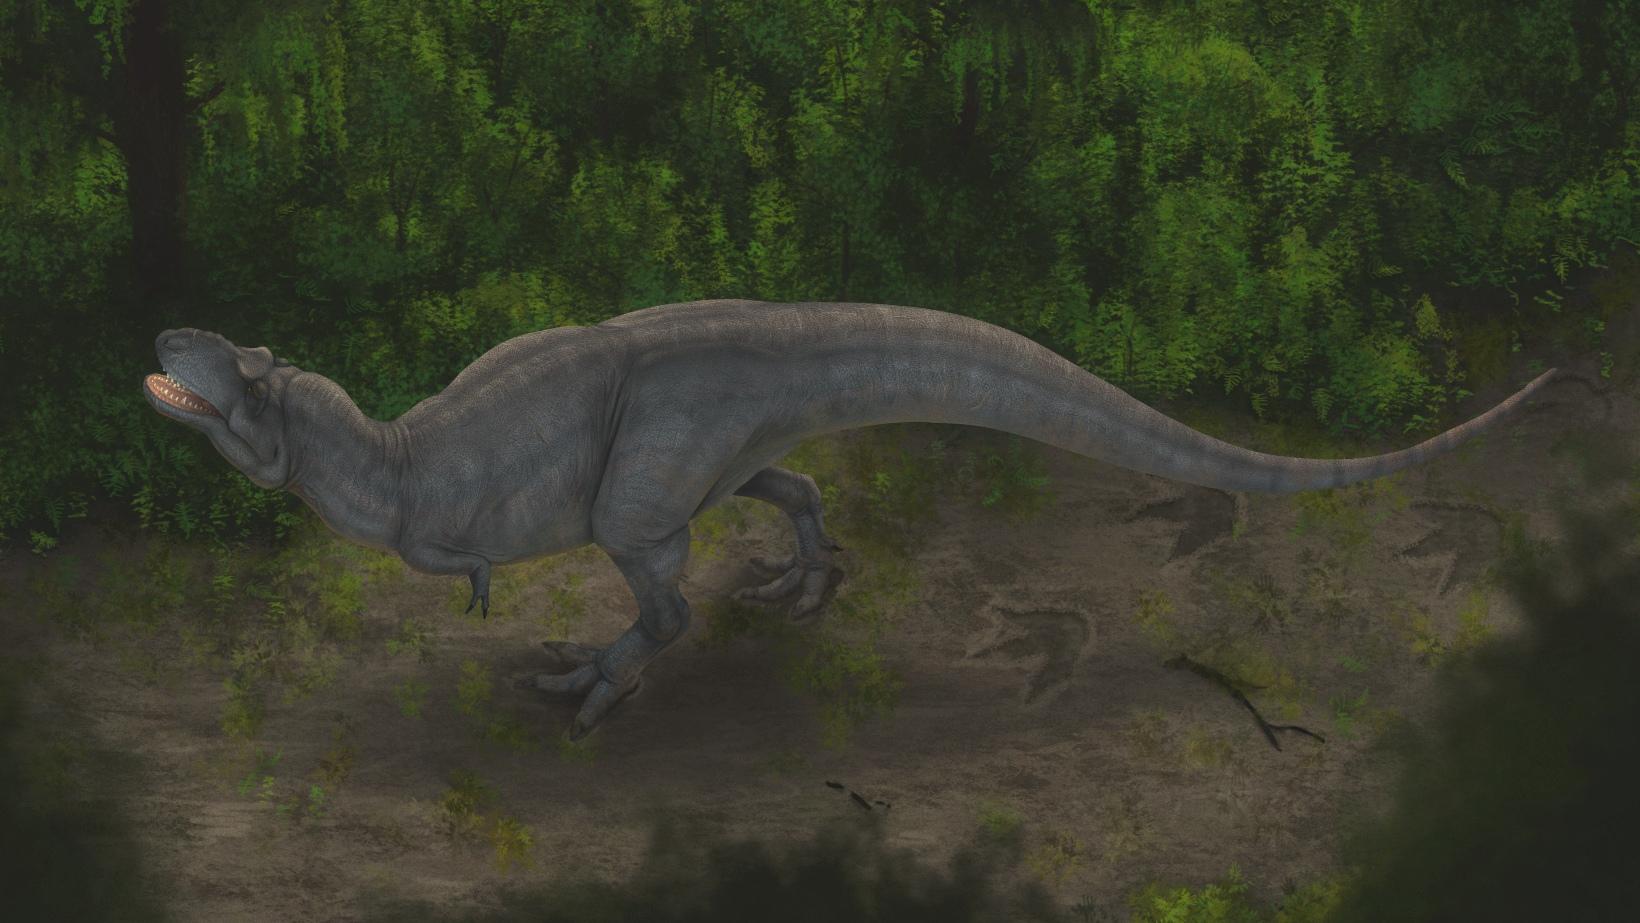 210421-tyrannosaur-footprints-image1-main.jpg